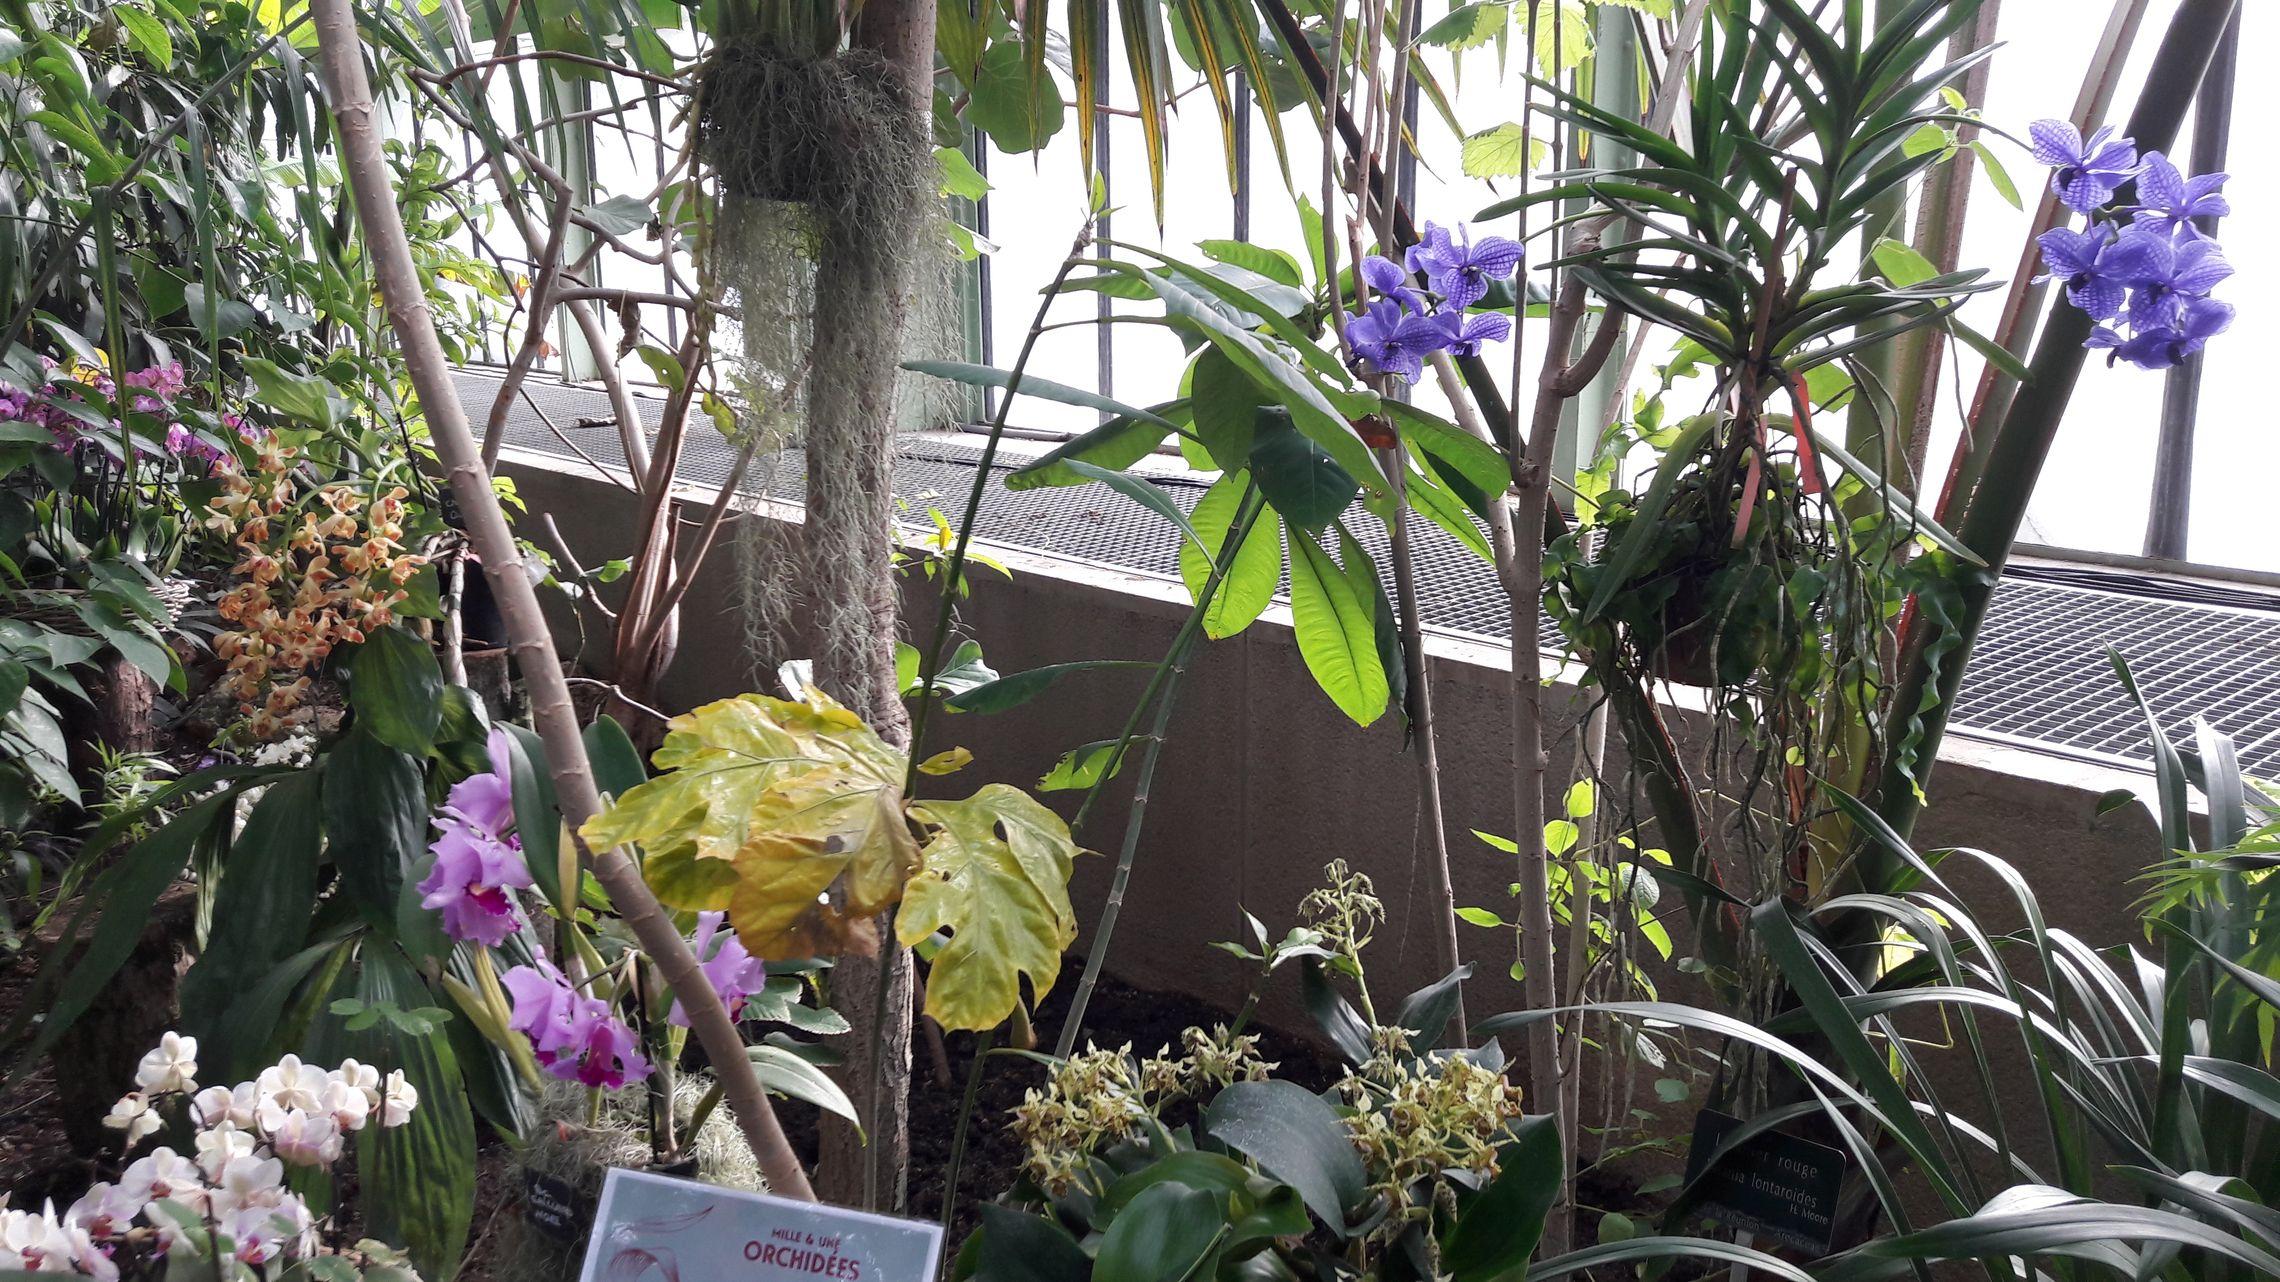 20170219 Jardin des Plantes 04